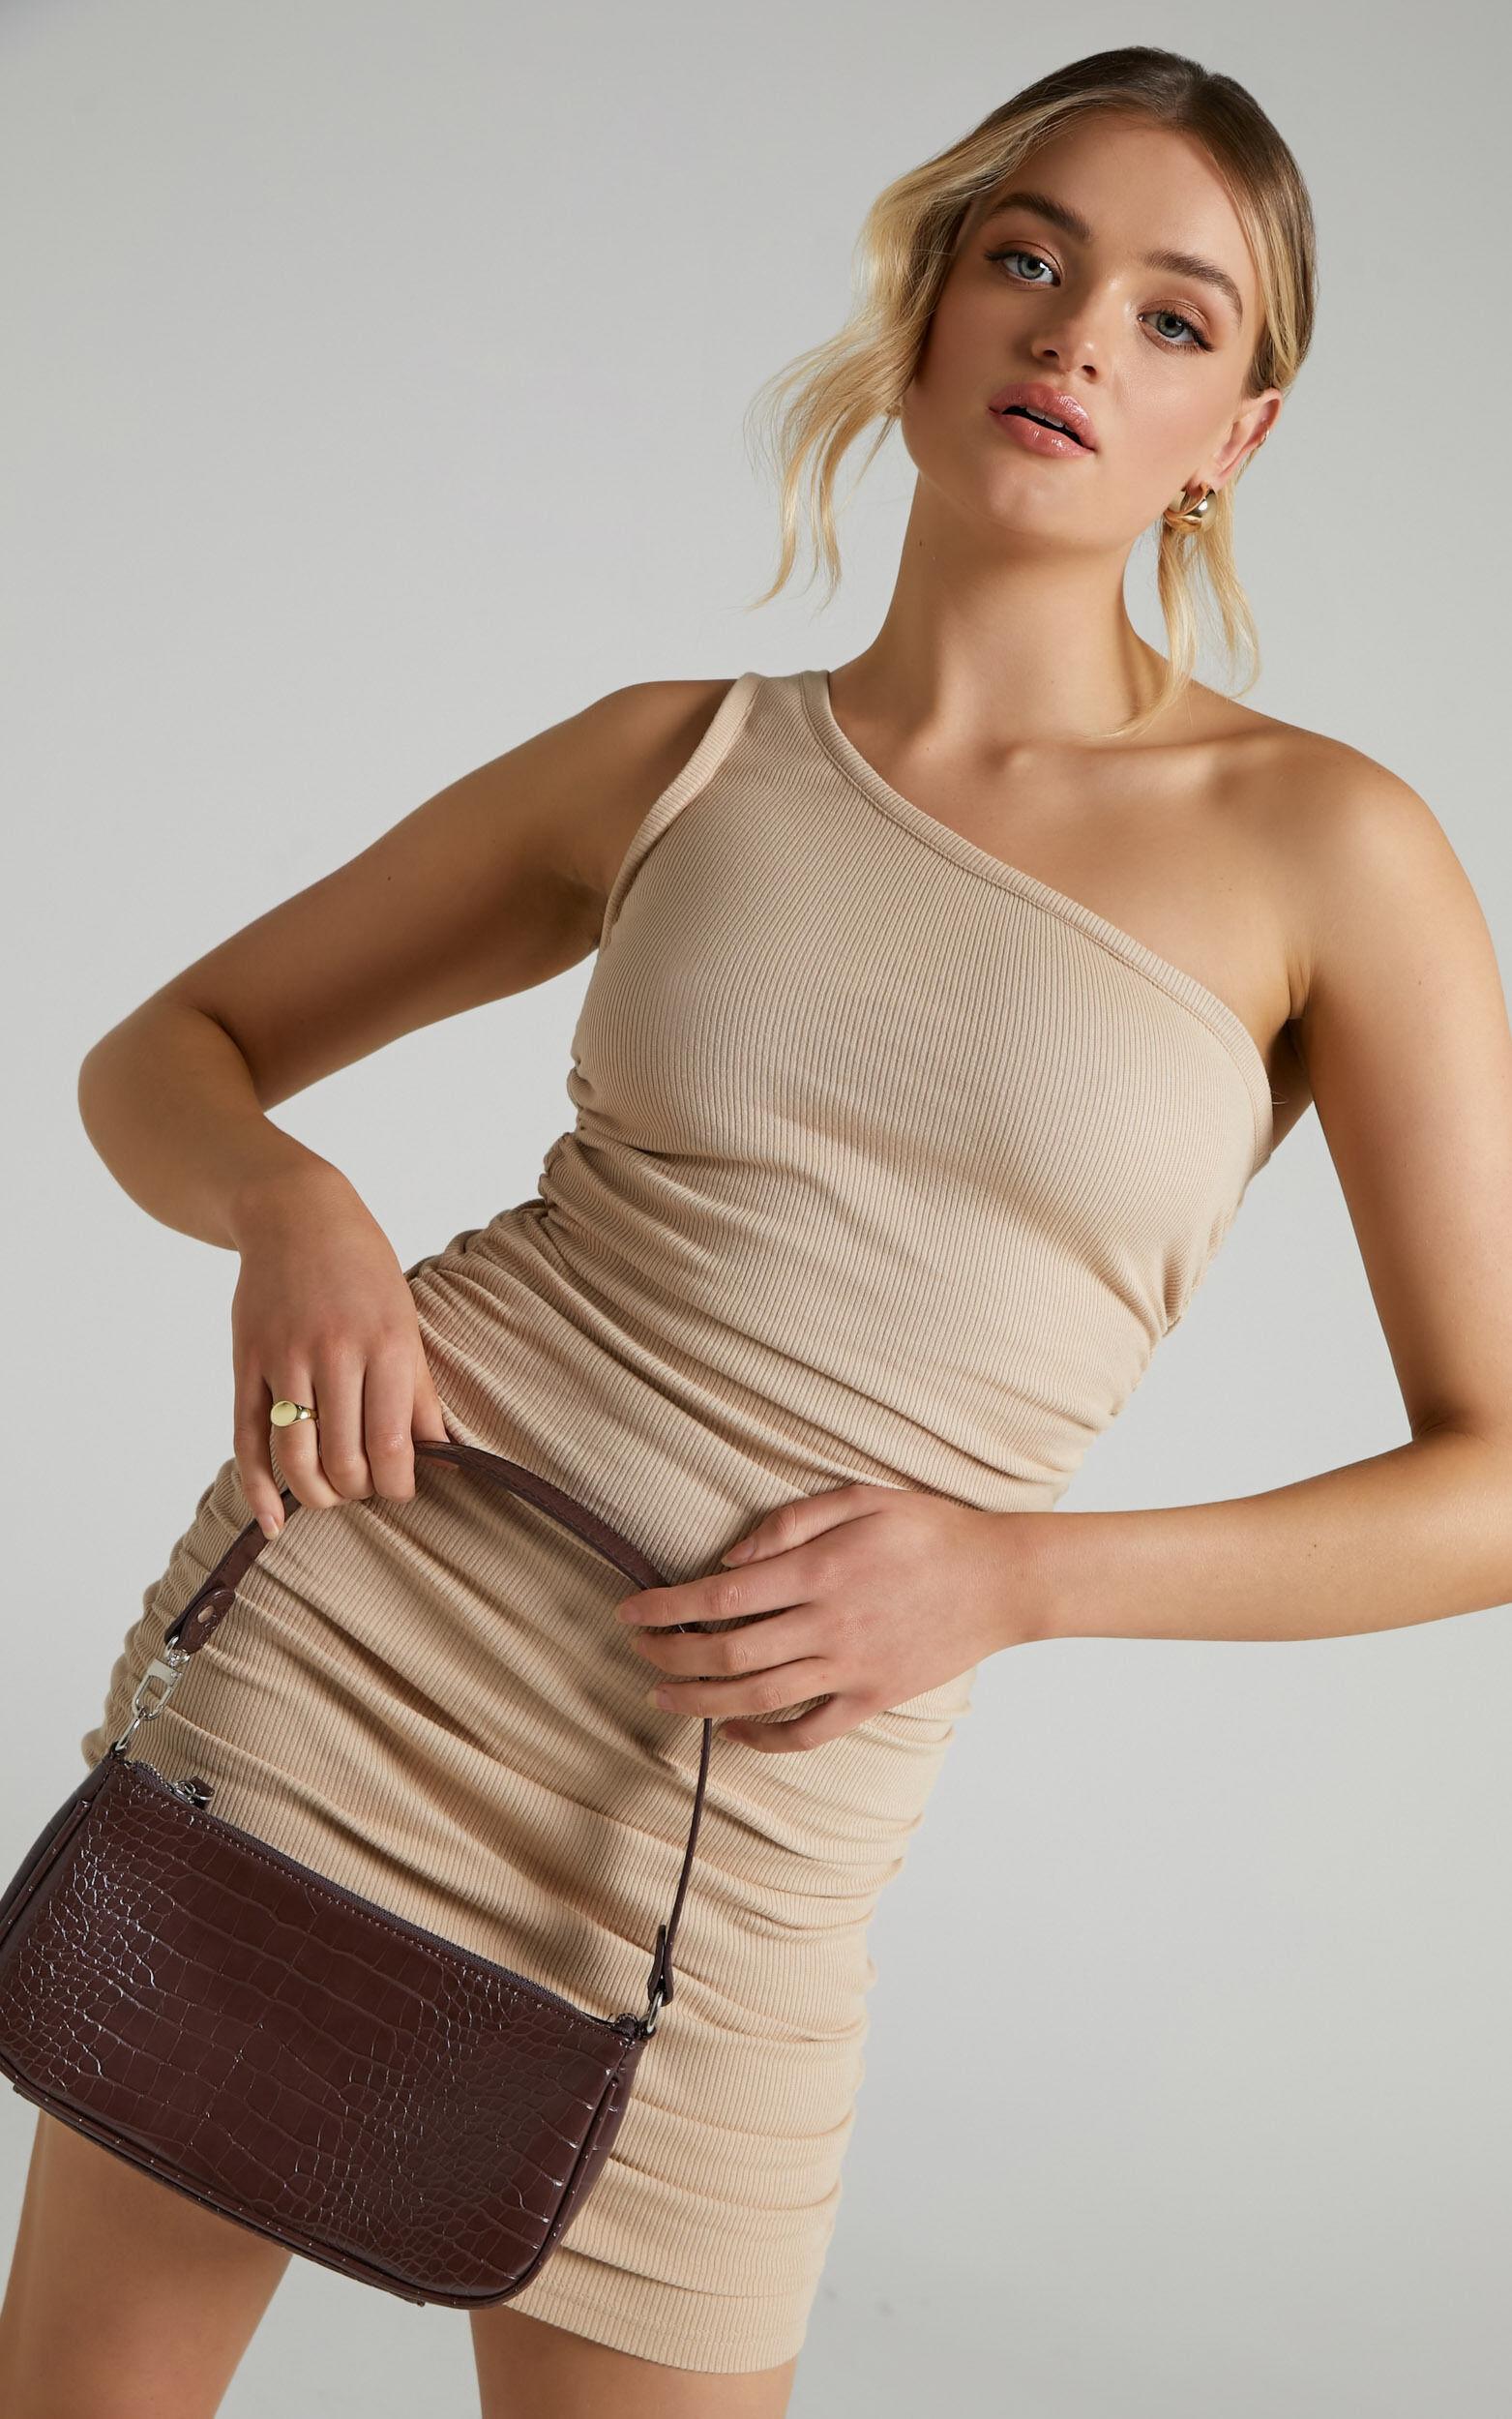 She.Is.Us - Tamika Dress in Sand - L, BRN1, super-hi-res image number null